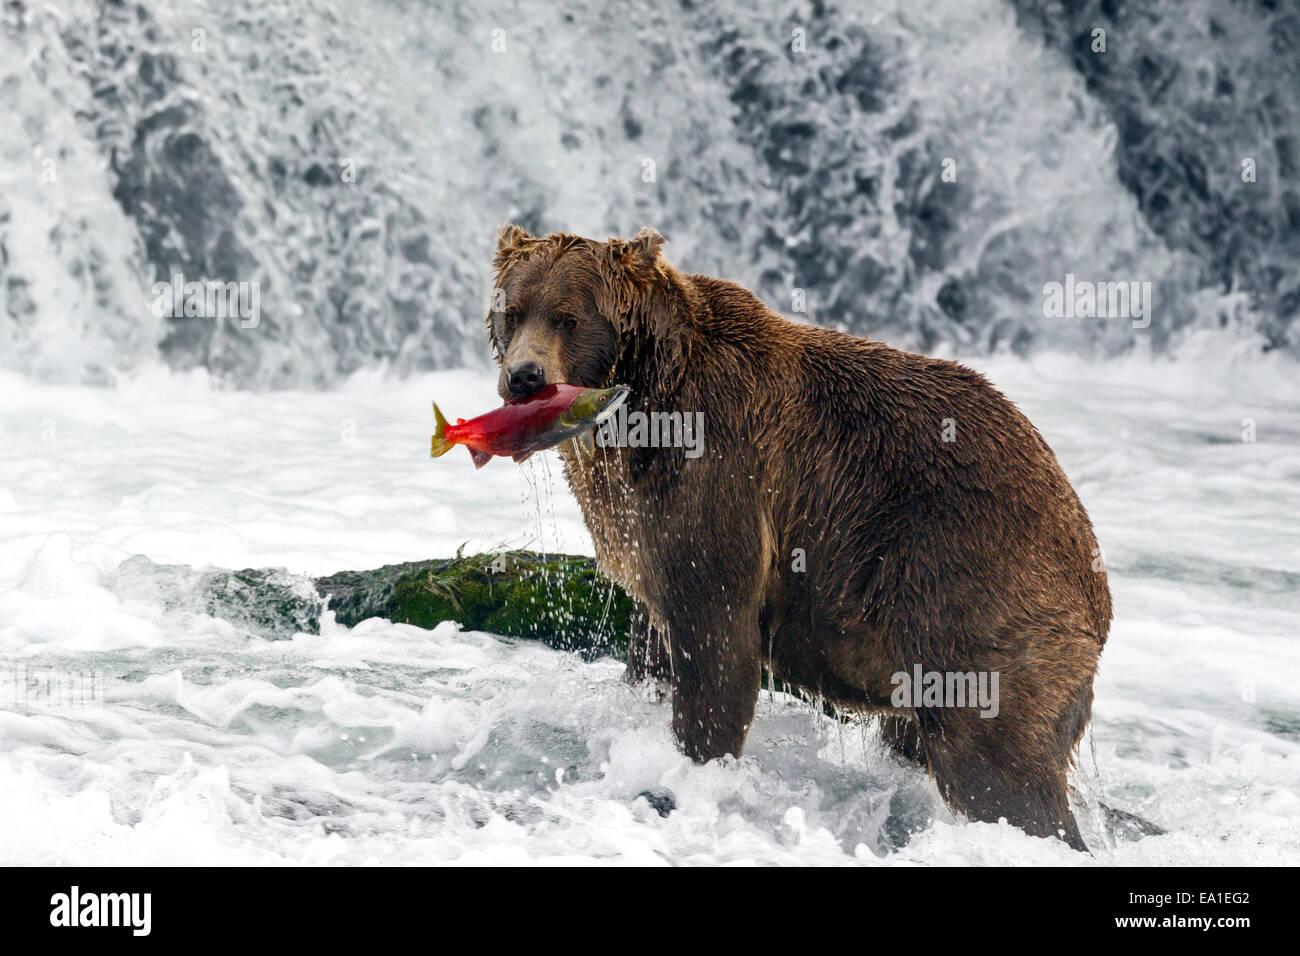 Male brown bear catching spawning red salmon at Brooks Falls, Katmai National Park, Alaska - Stock Image